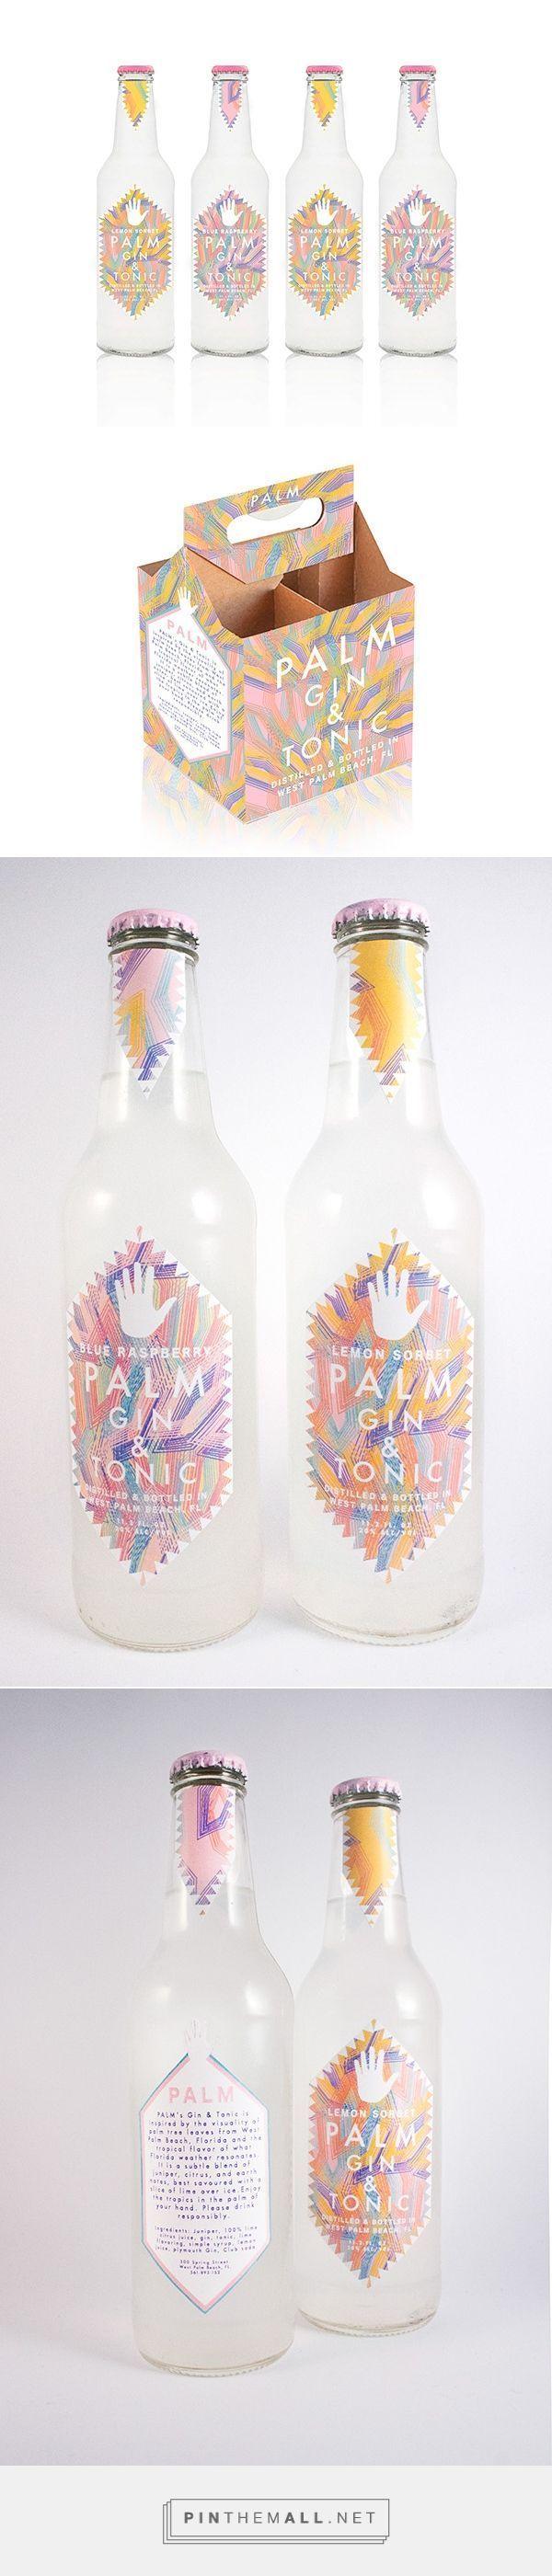 Hometown Gin and Tonic packaging on Pratt Portfolios